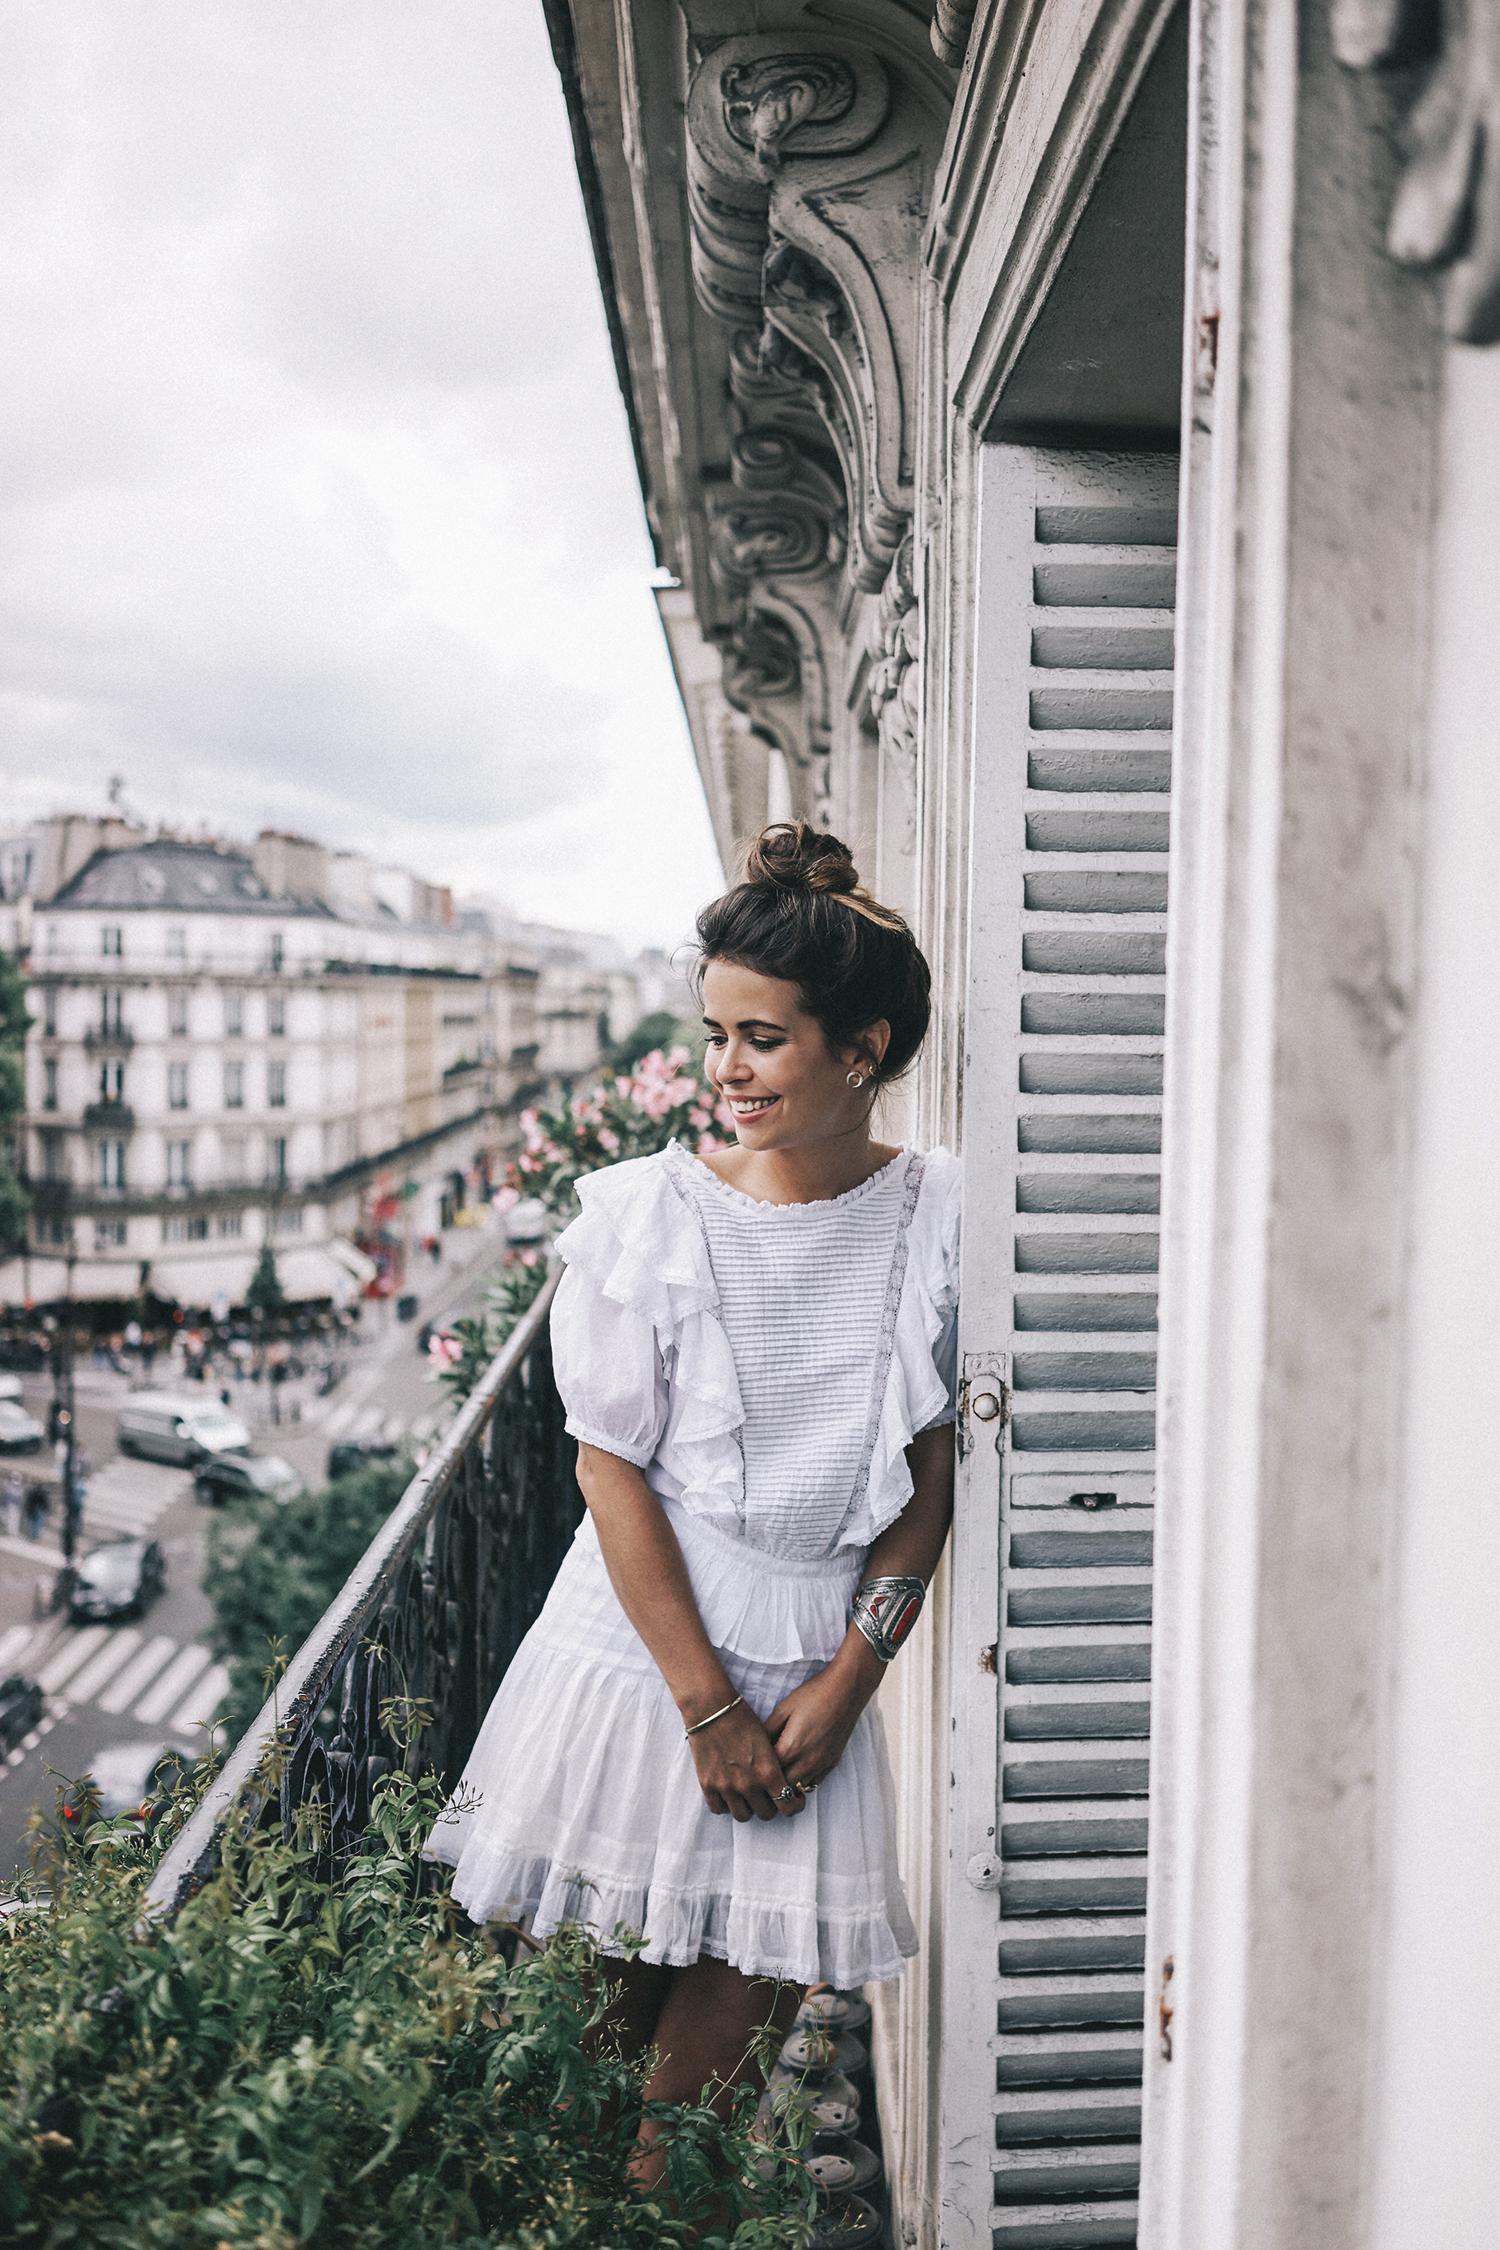 Home_Away-Isabel_Marant_Dress-Outfit-Paris-Collage_Vintage-6